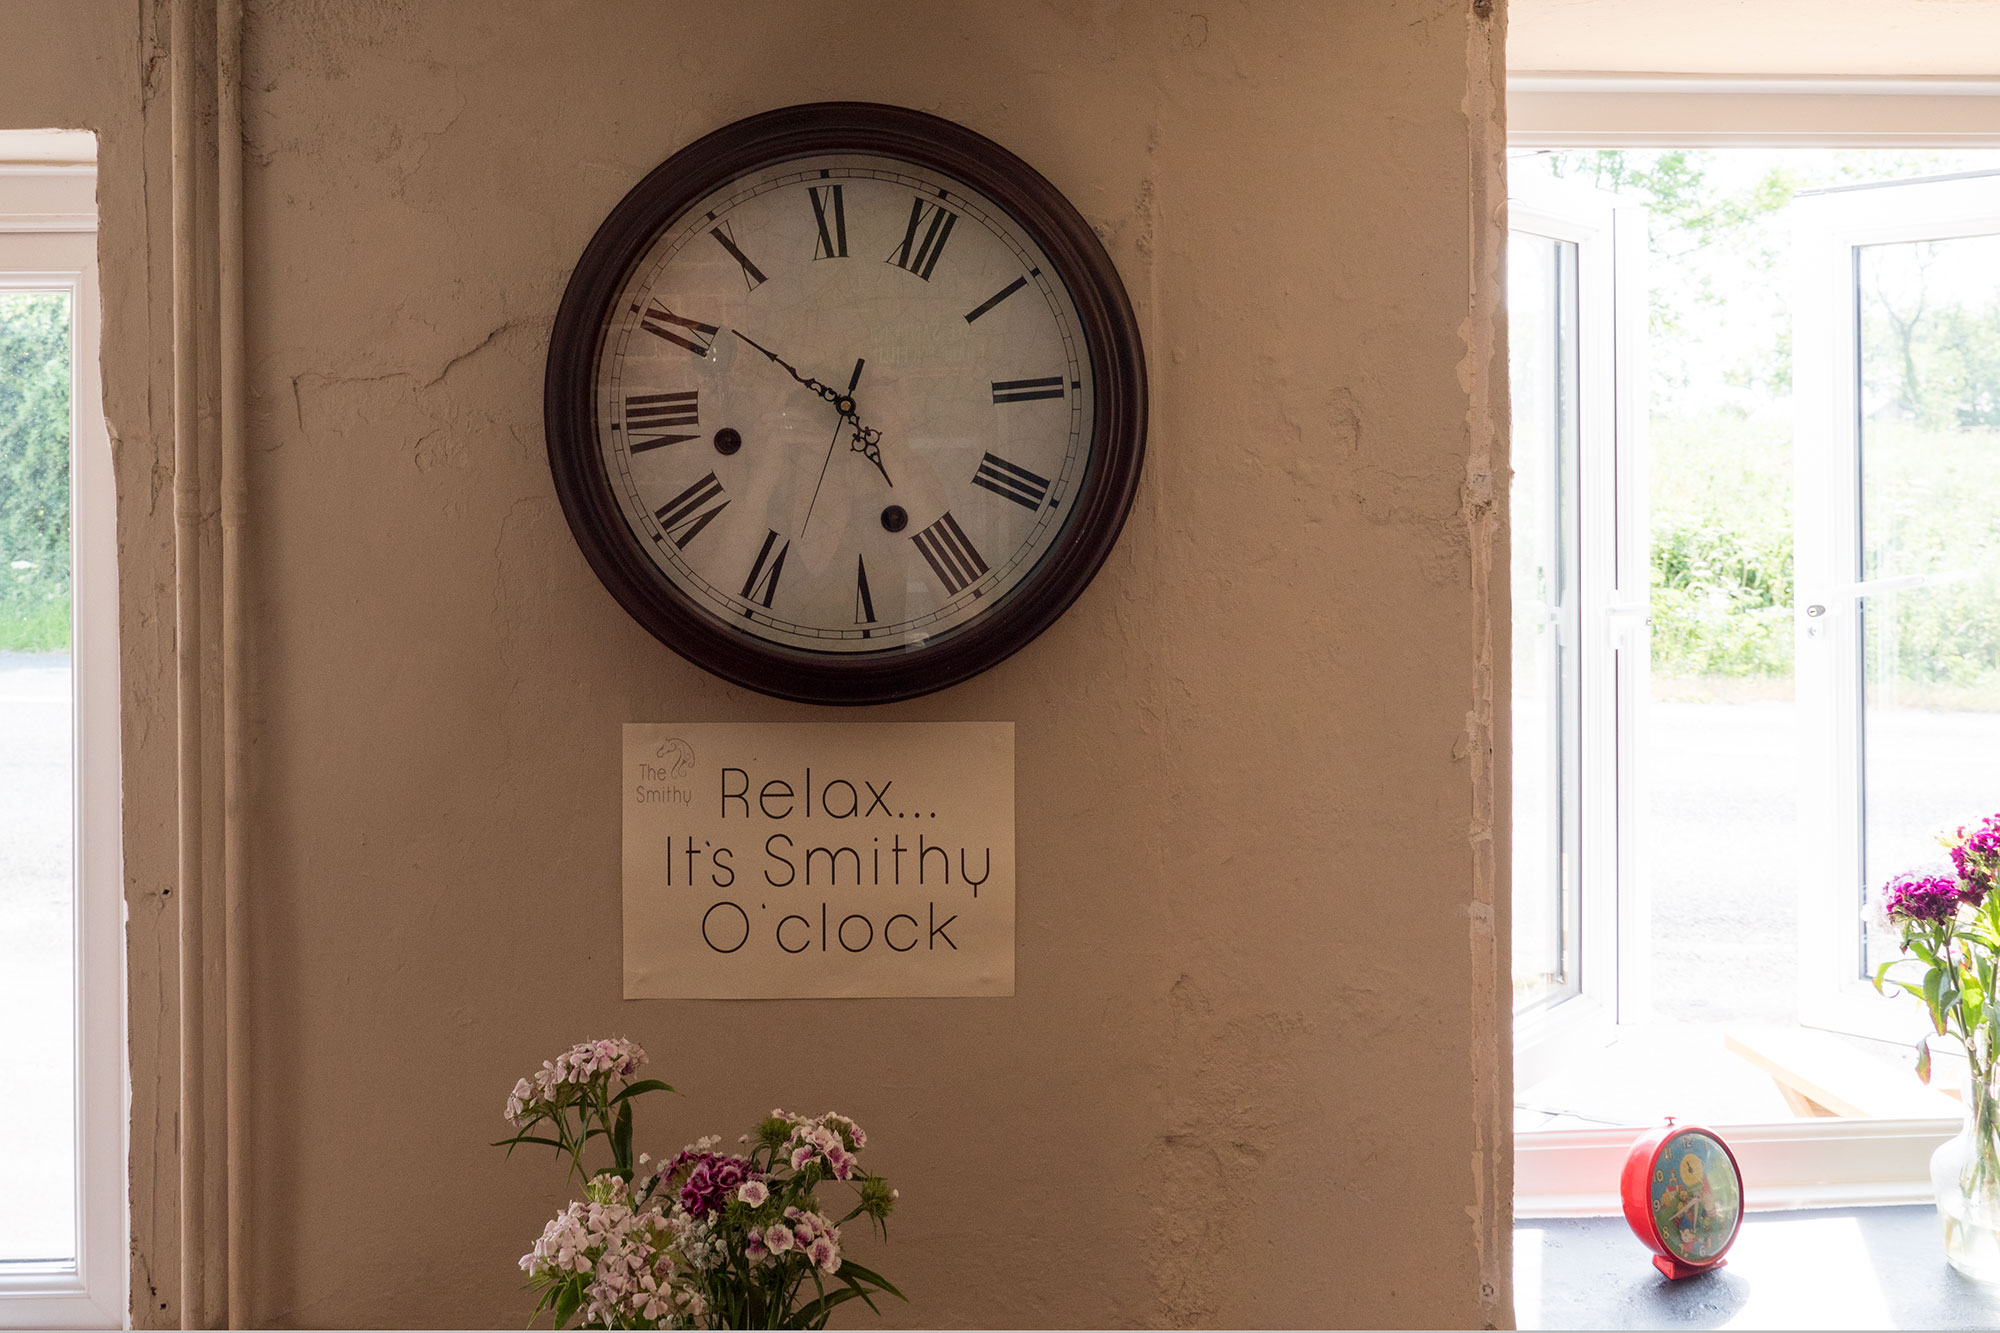 It's Smithy O'clock